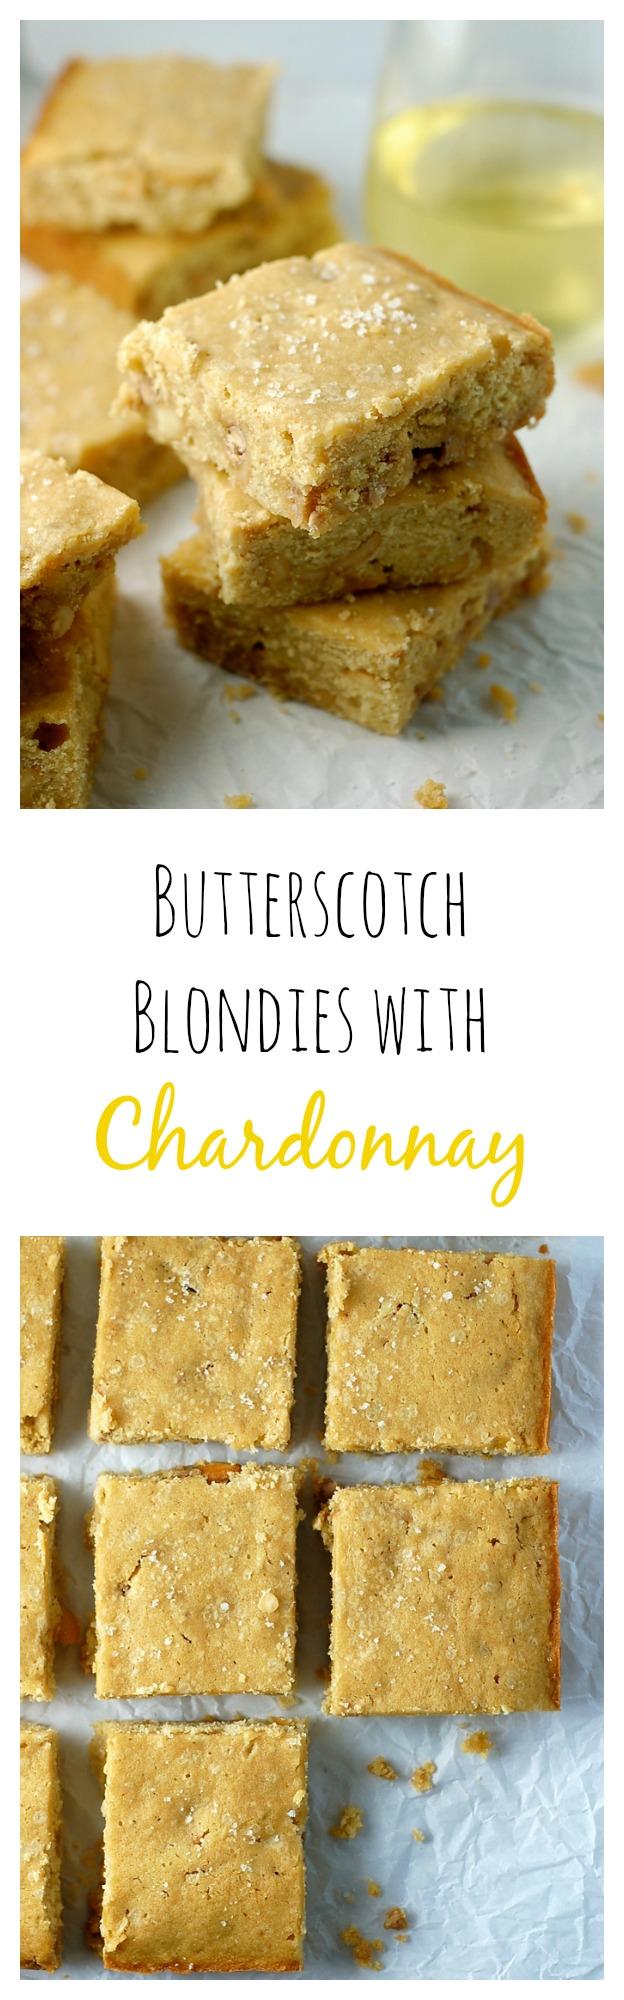 Easy one-bowl butterscotch blondies with chardonnay. Treat yo self!